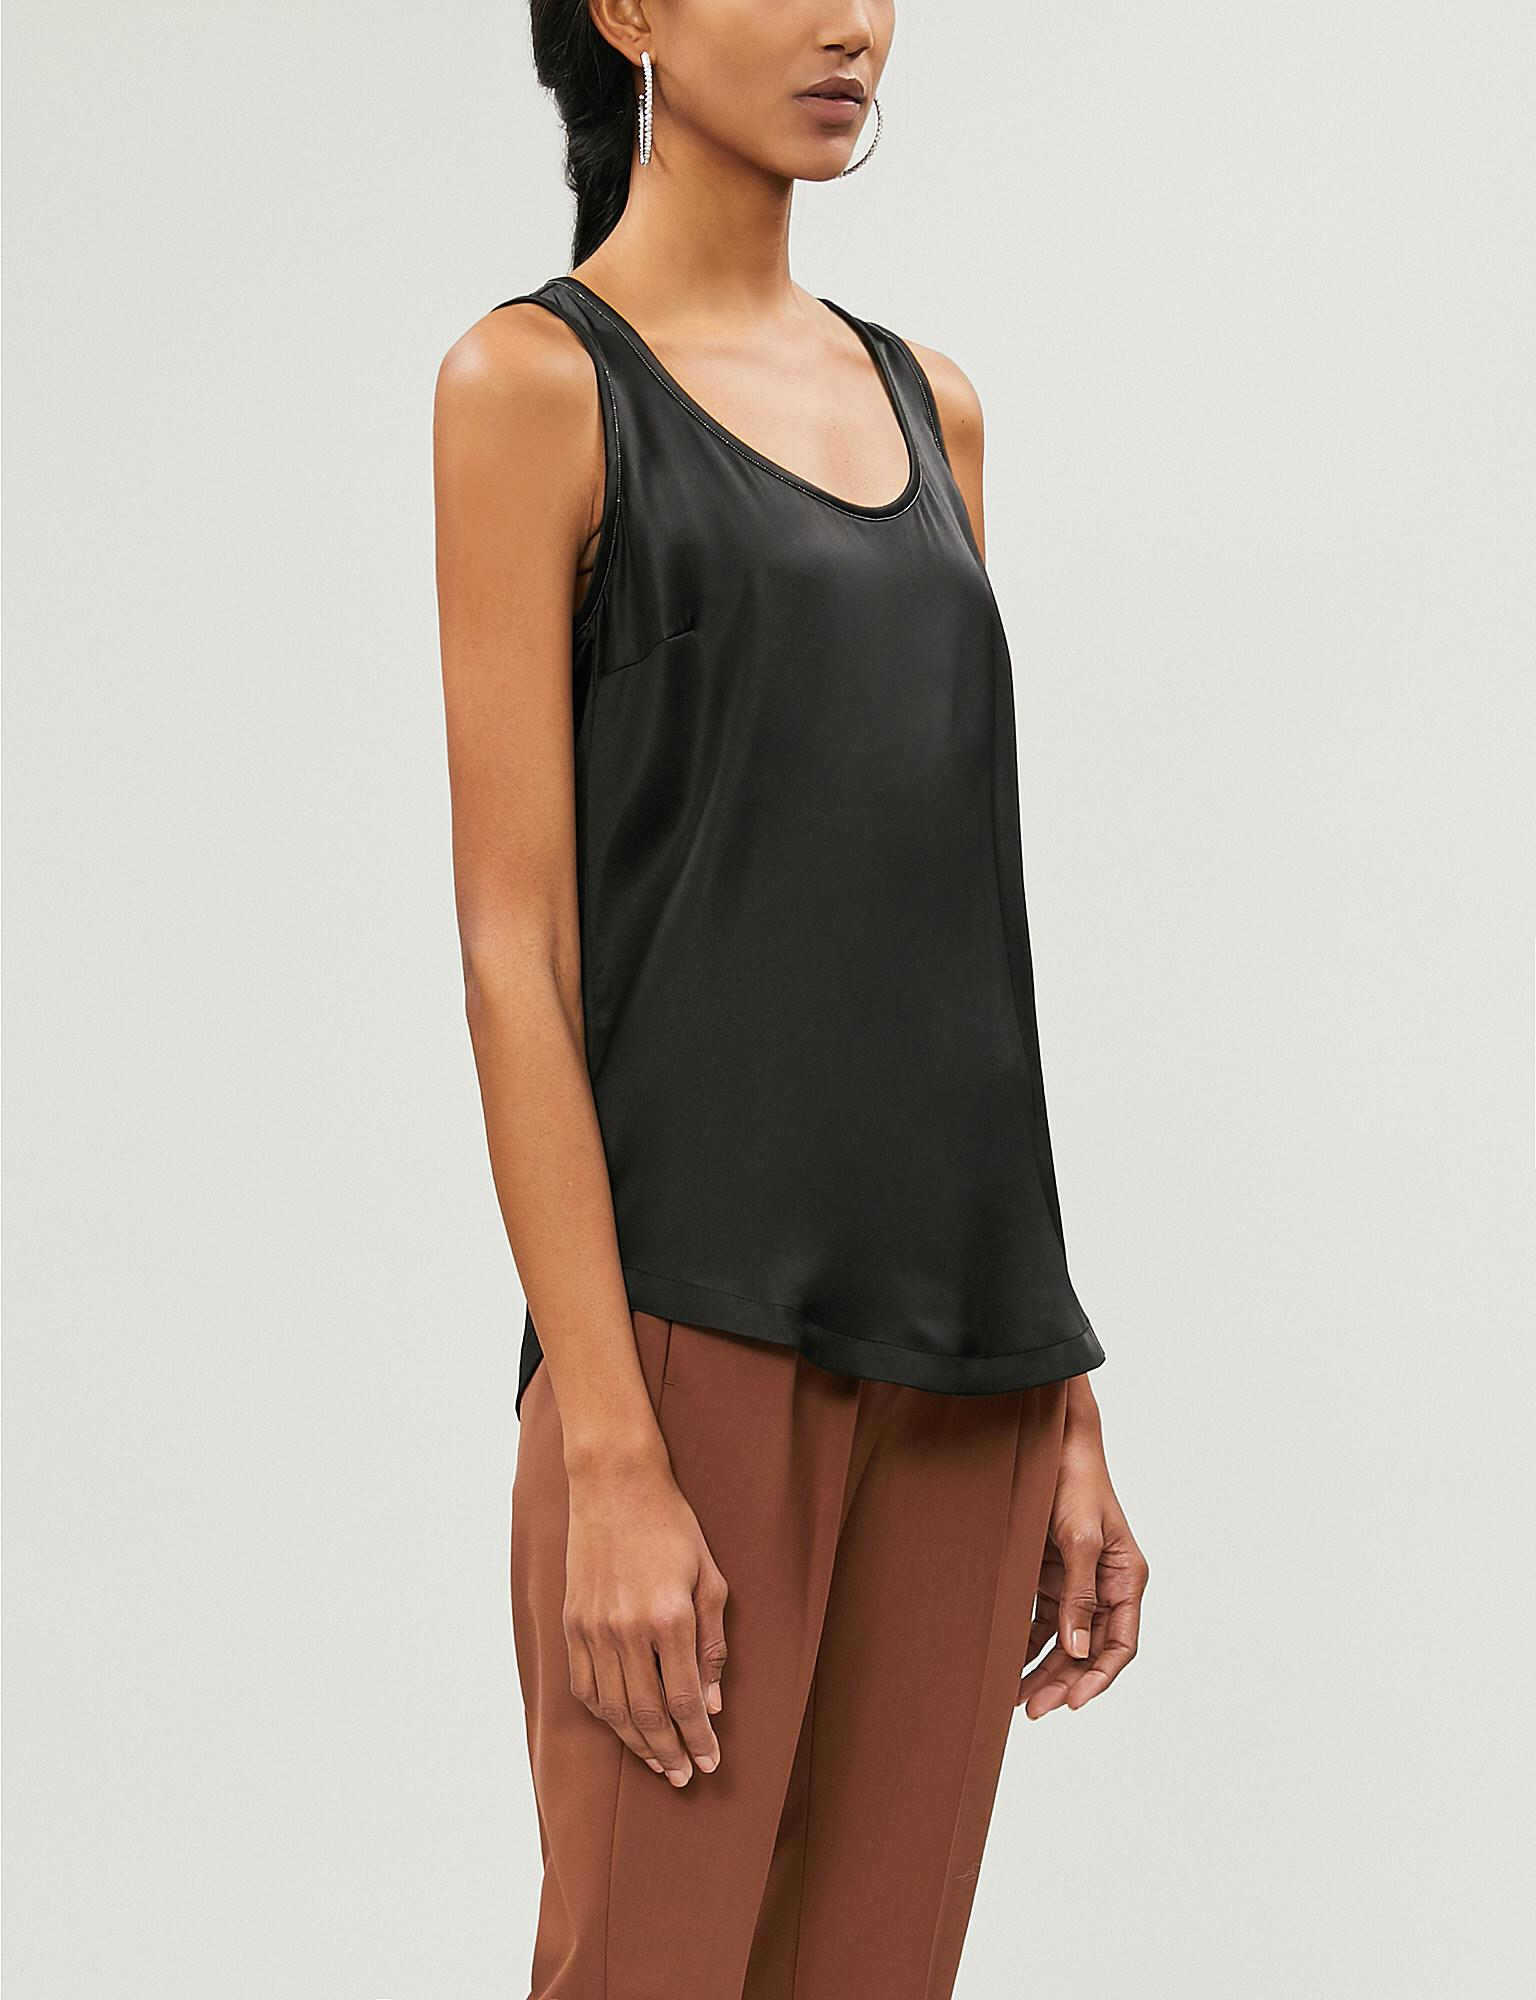 04036abfe8fc6 Brunello Cucinelli. Women s Black Bead-embellished Stretch-silk Vest Top